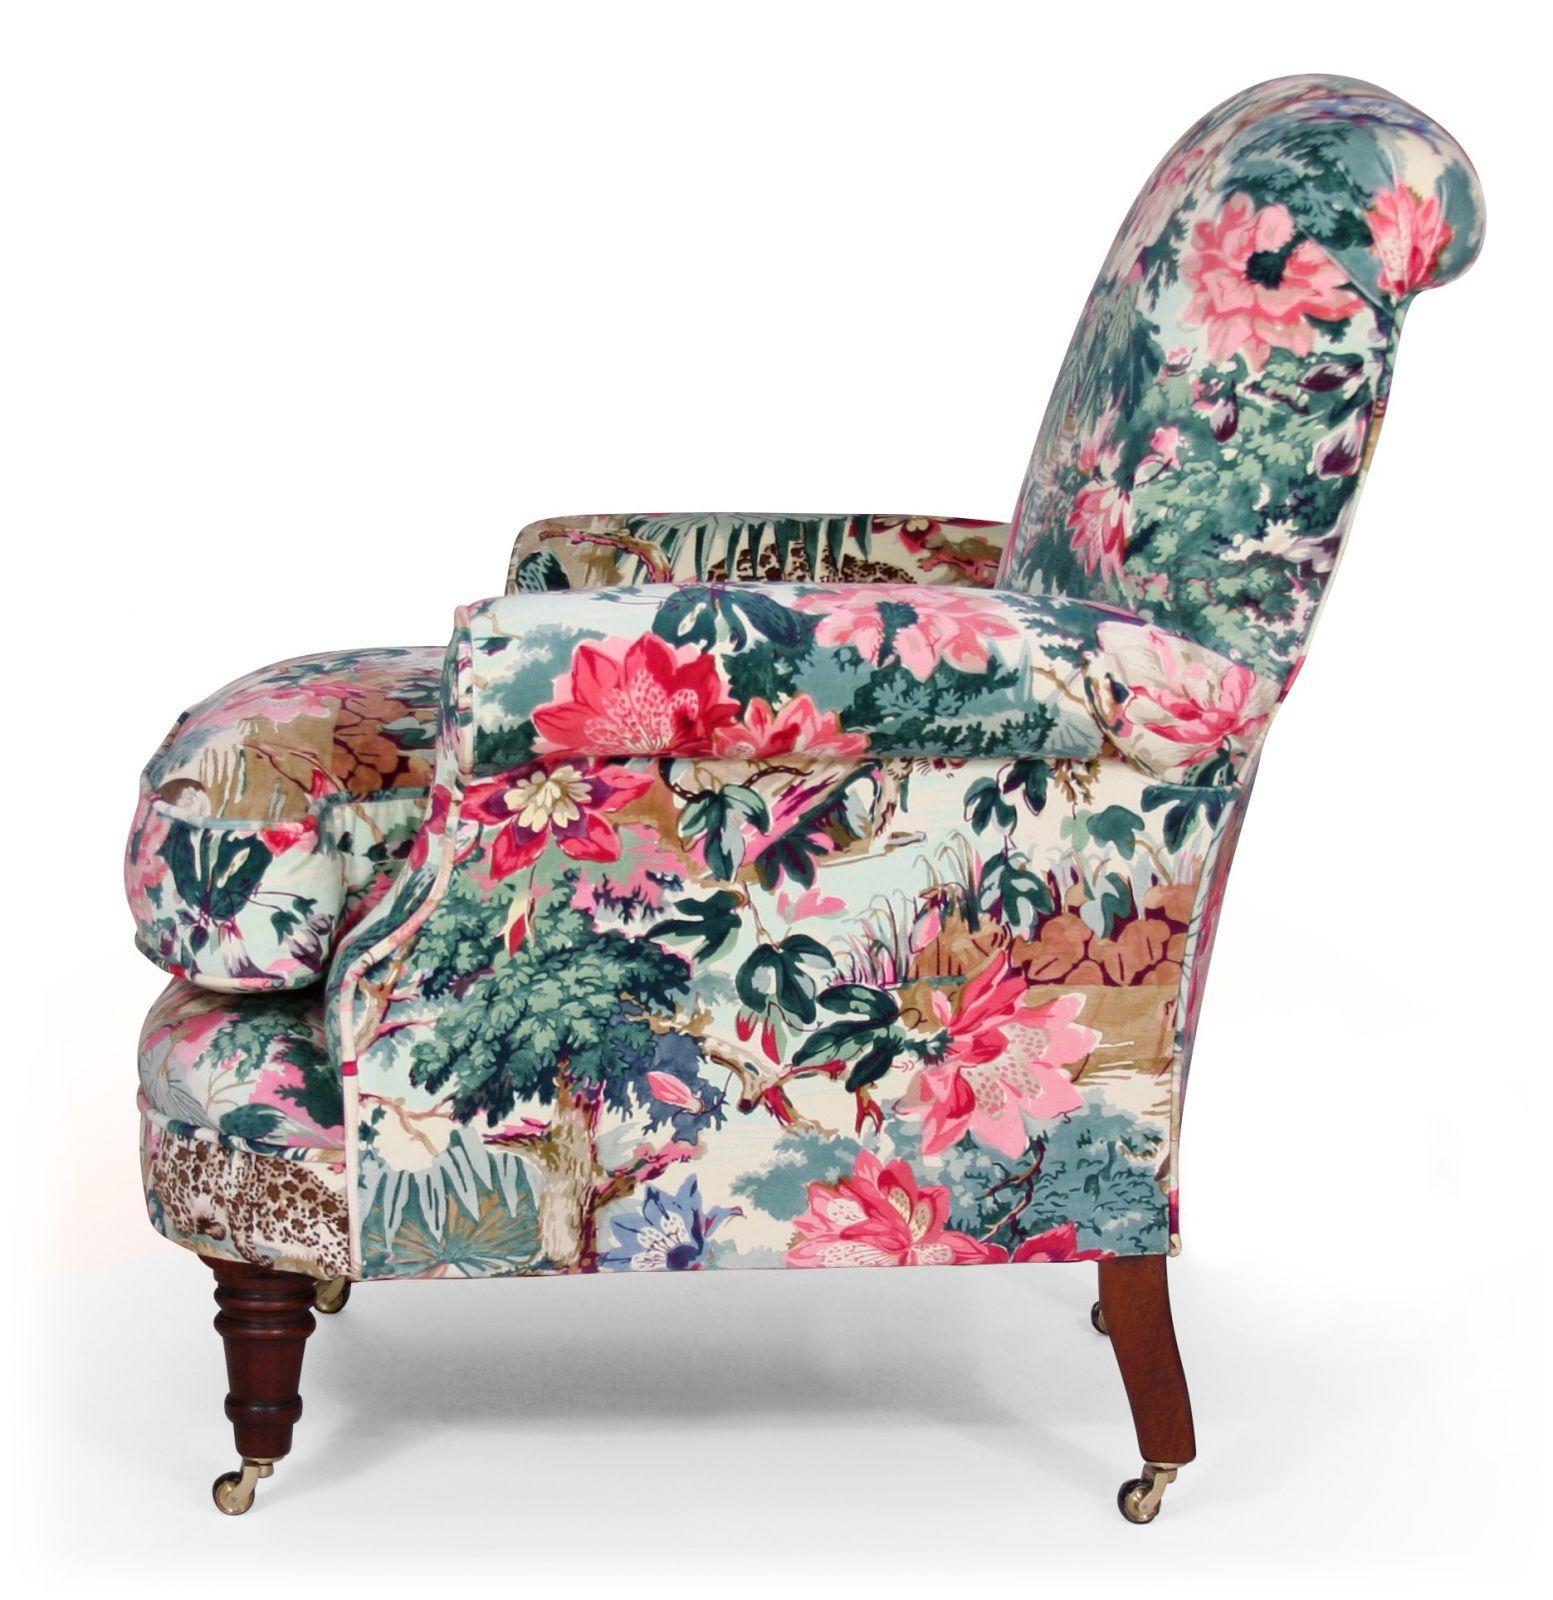 Shelley bedroom chair in Linwood Jungle Rumble velvet